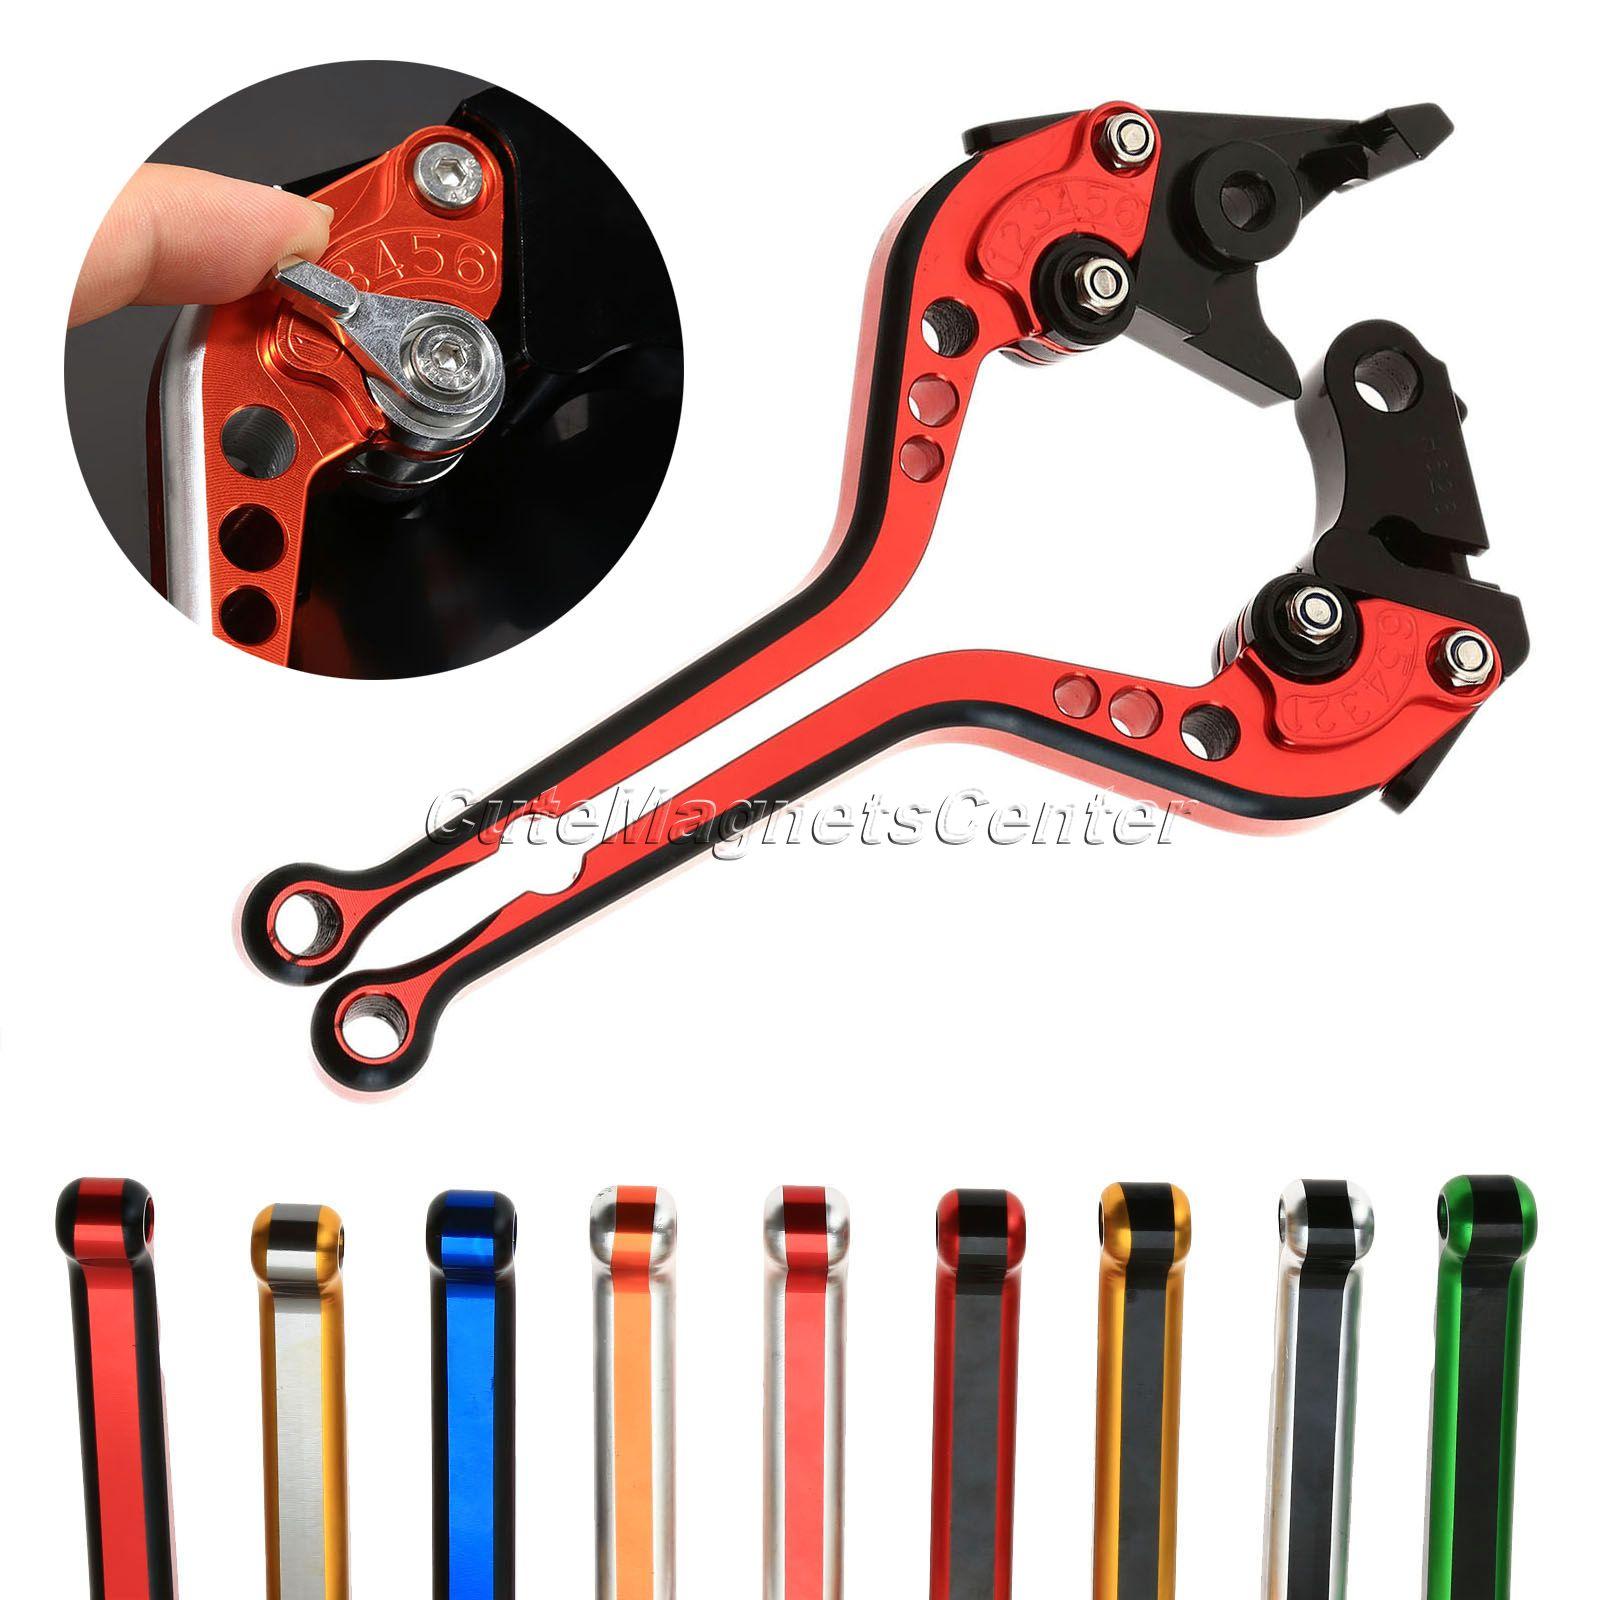 Double Colors CNC Adjustable Long Brake Clutch Lever For BMW R1200RT /SE 2010 11 12 13 R1200GS 2004 05 06 07 08 09 10 2011 2012